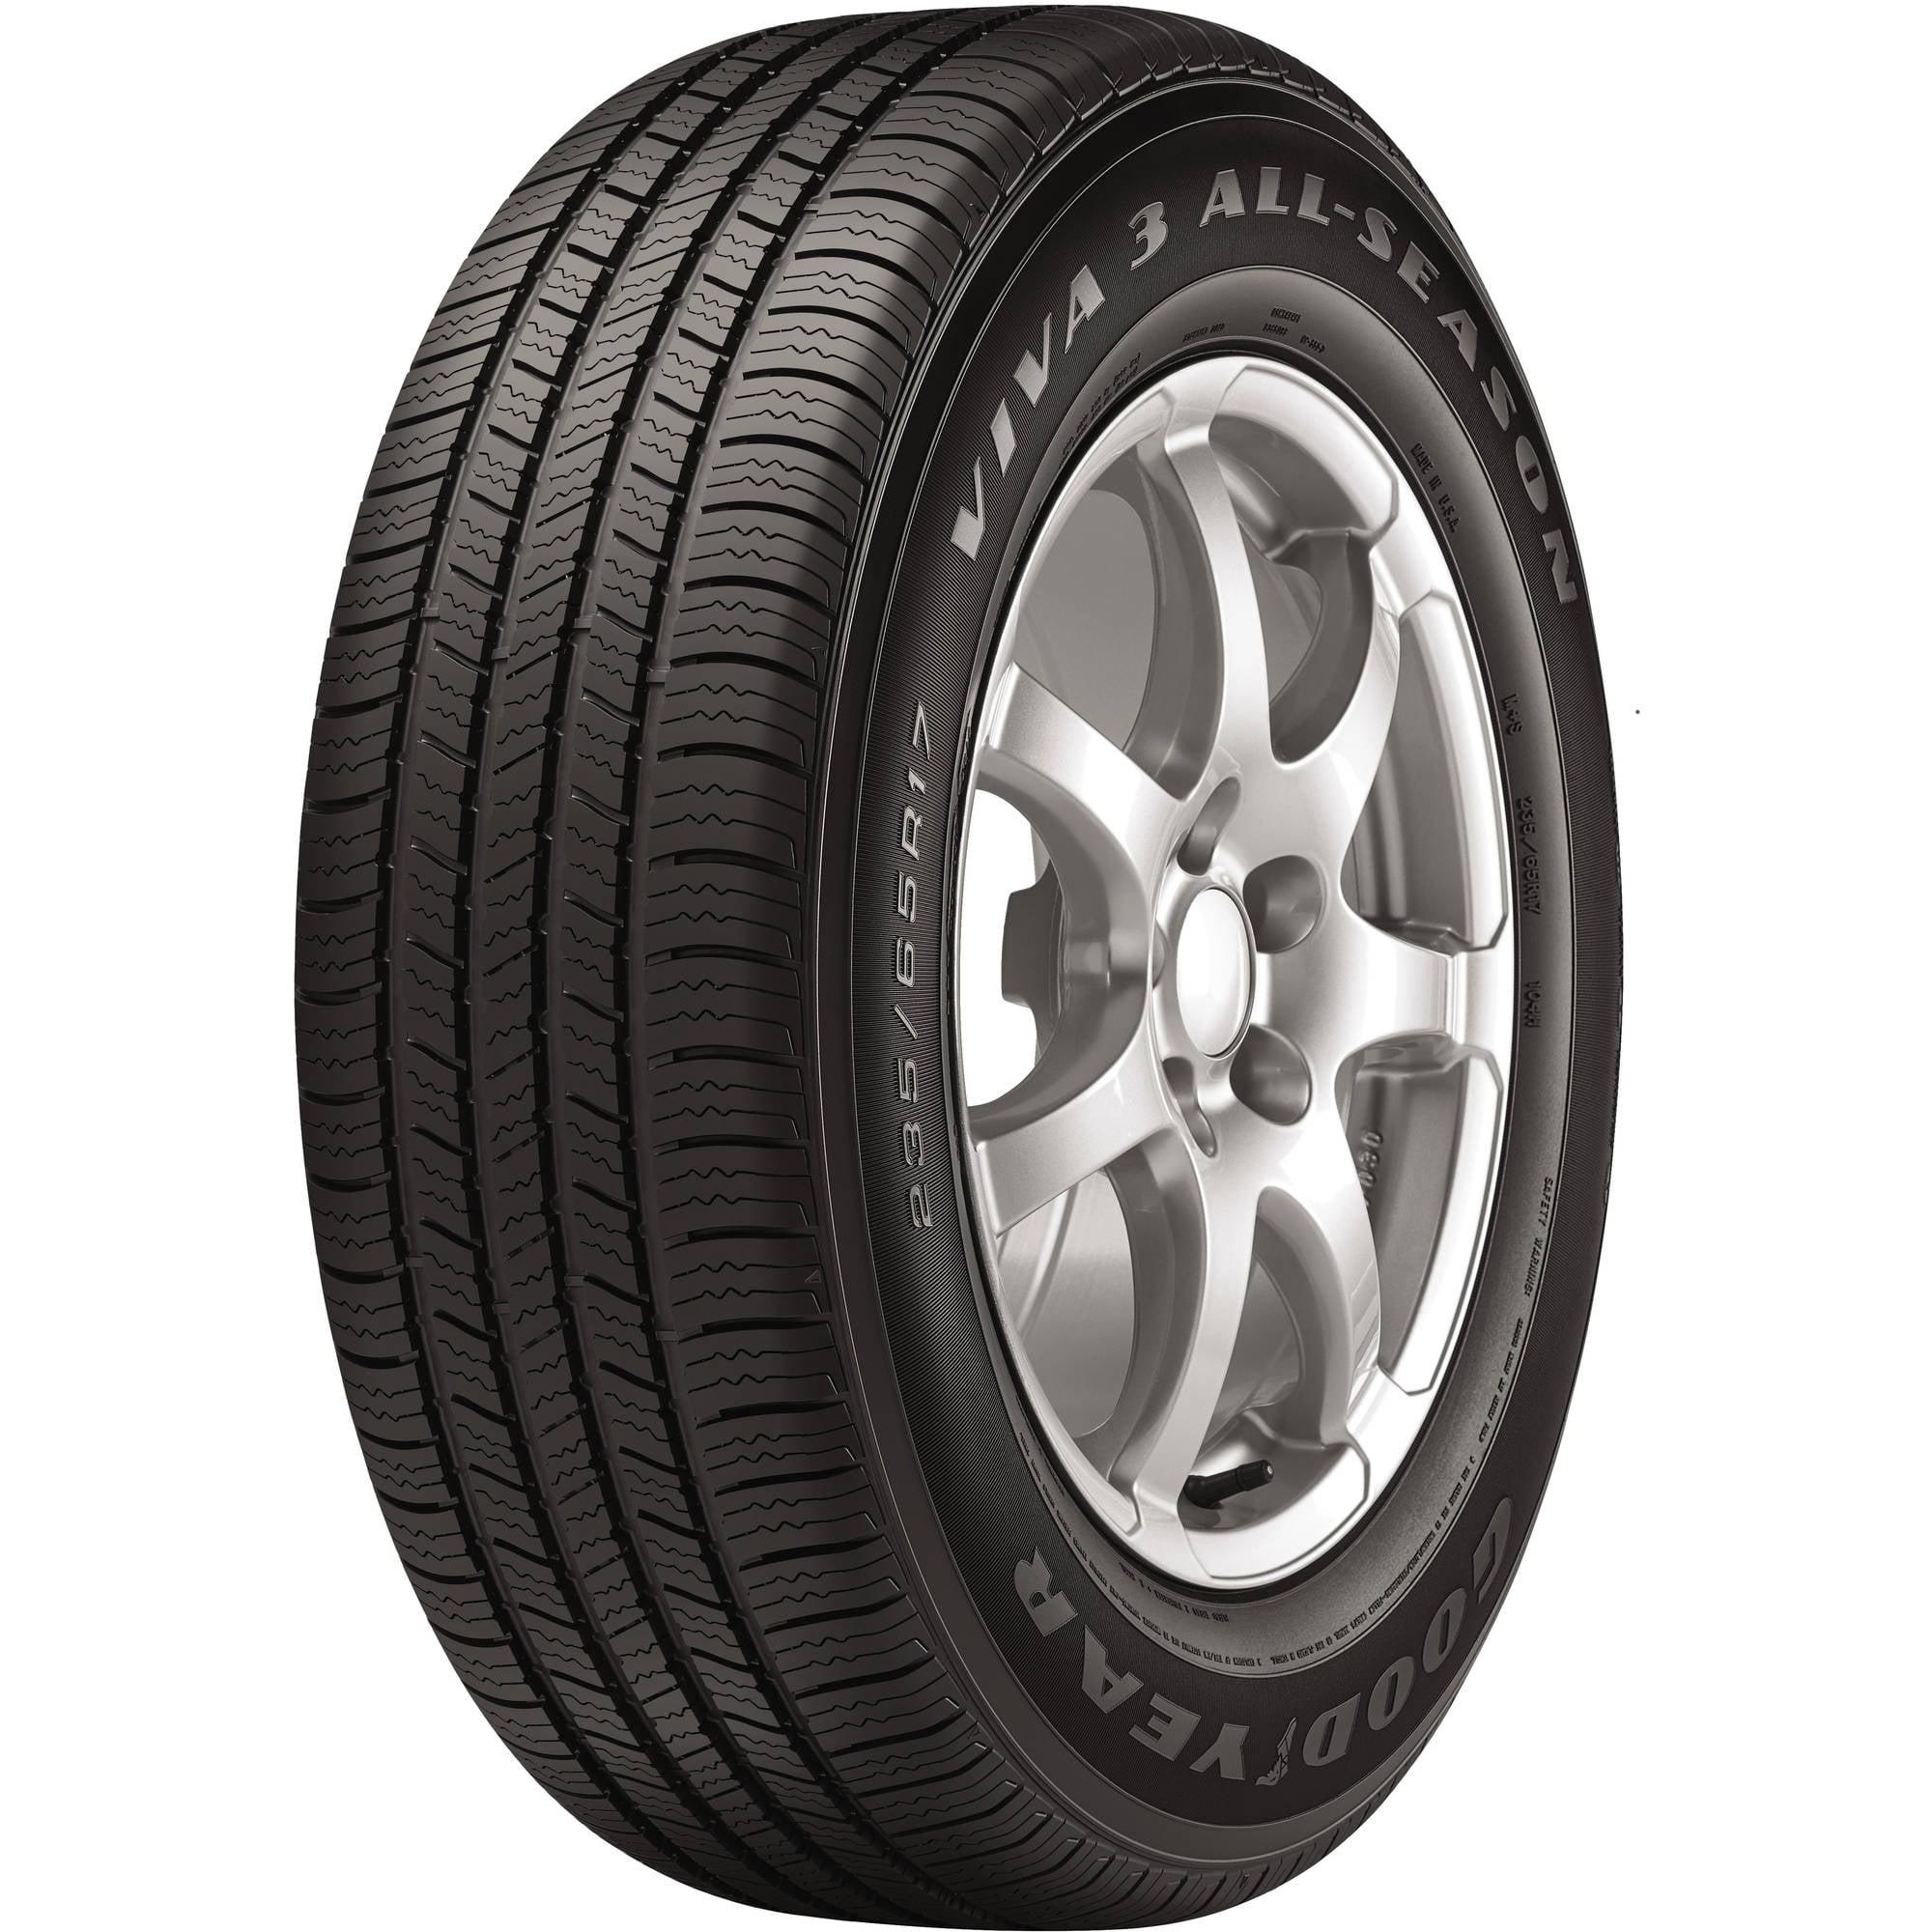 Snow Tires Winter Tires Goodyear Tires >> Goodyear Viva 3 All Season Tire 225 60r17 99h